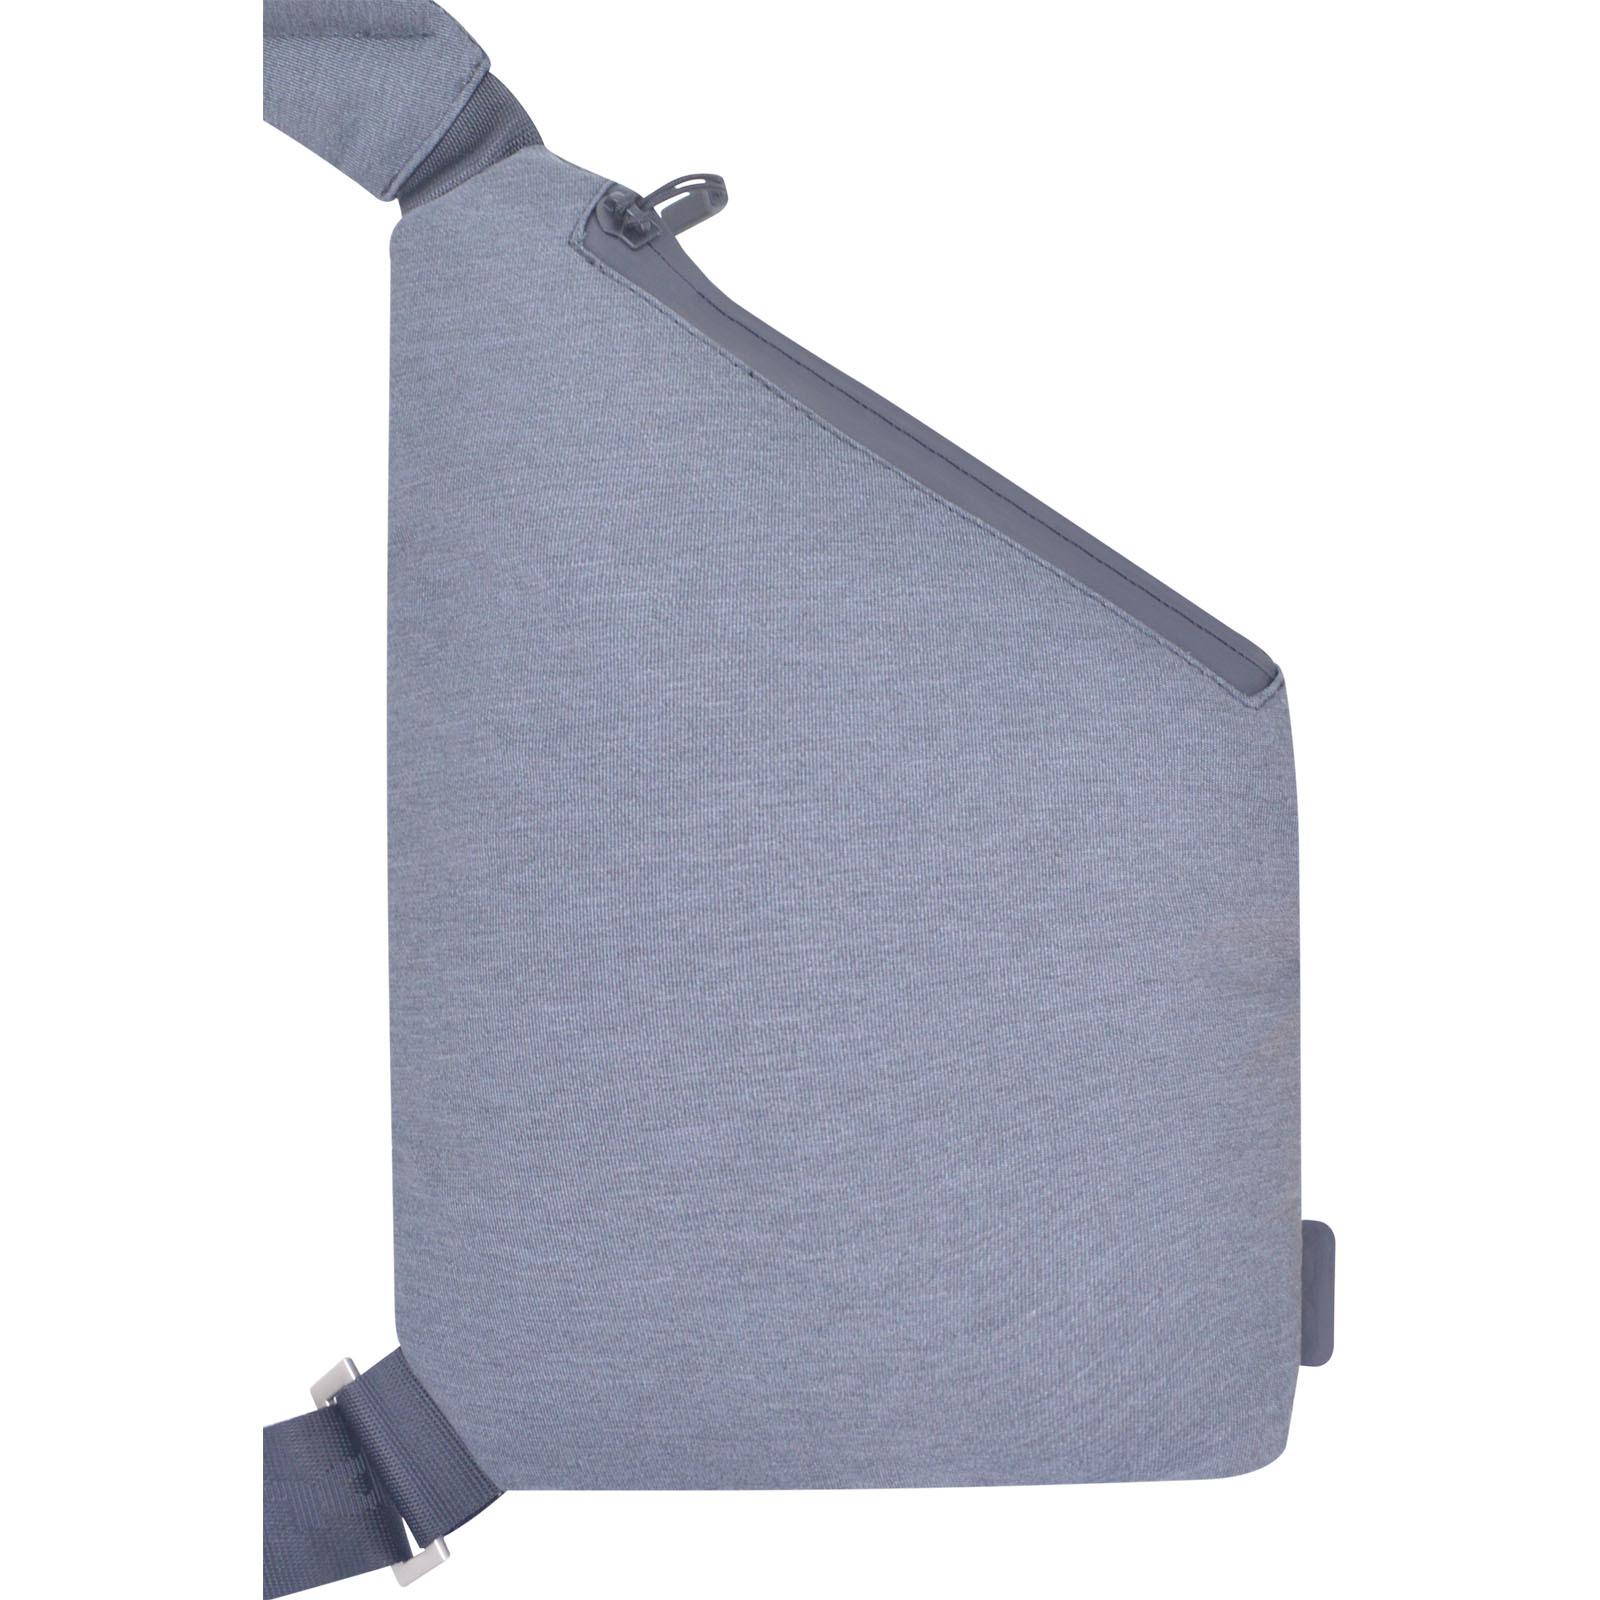 Сумка-мессенджер Bagland Triangle 3 л. серый (0021069)